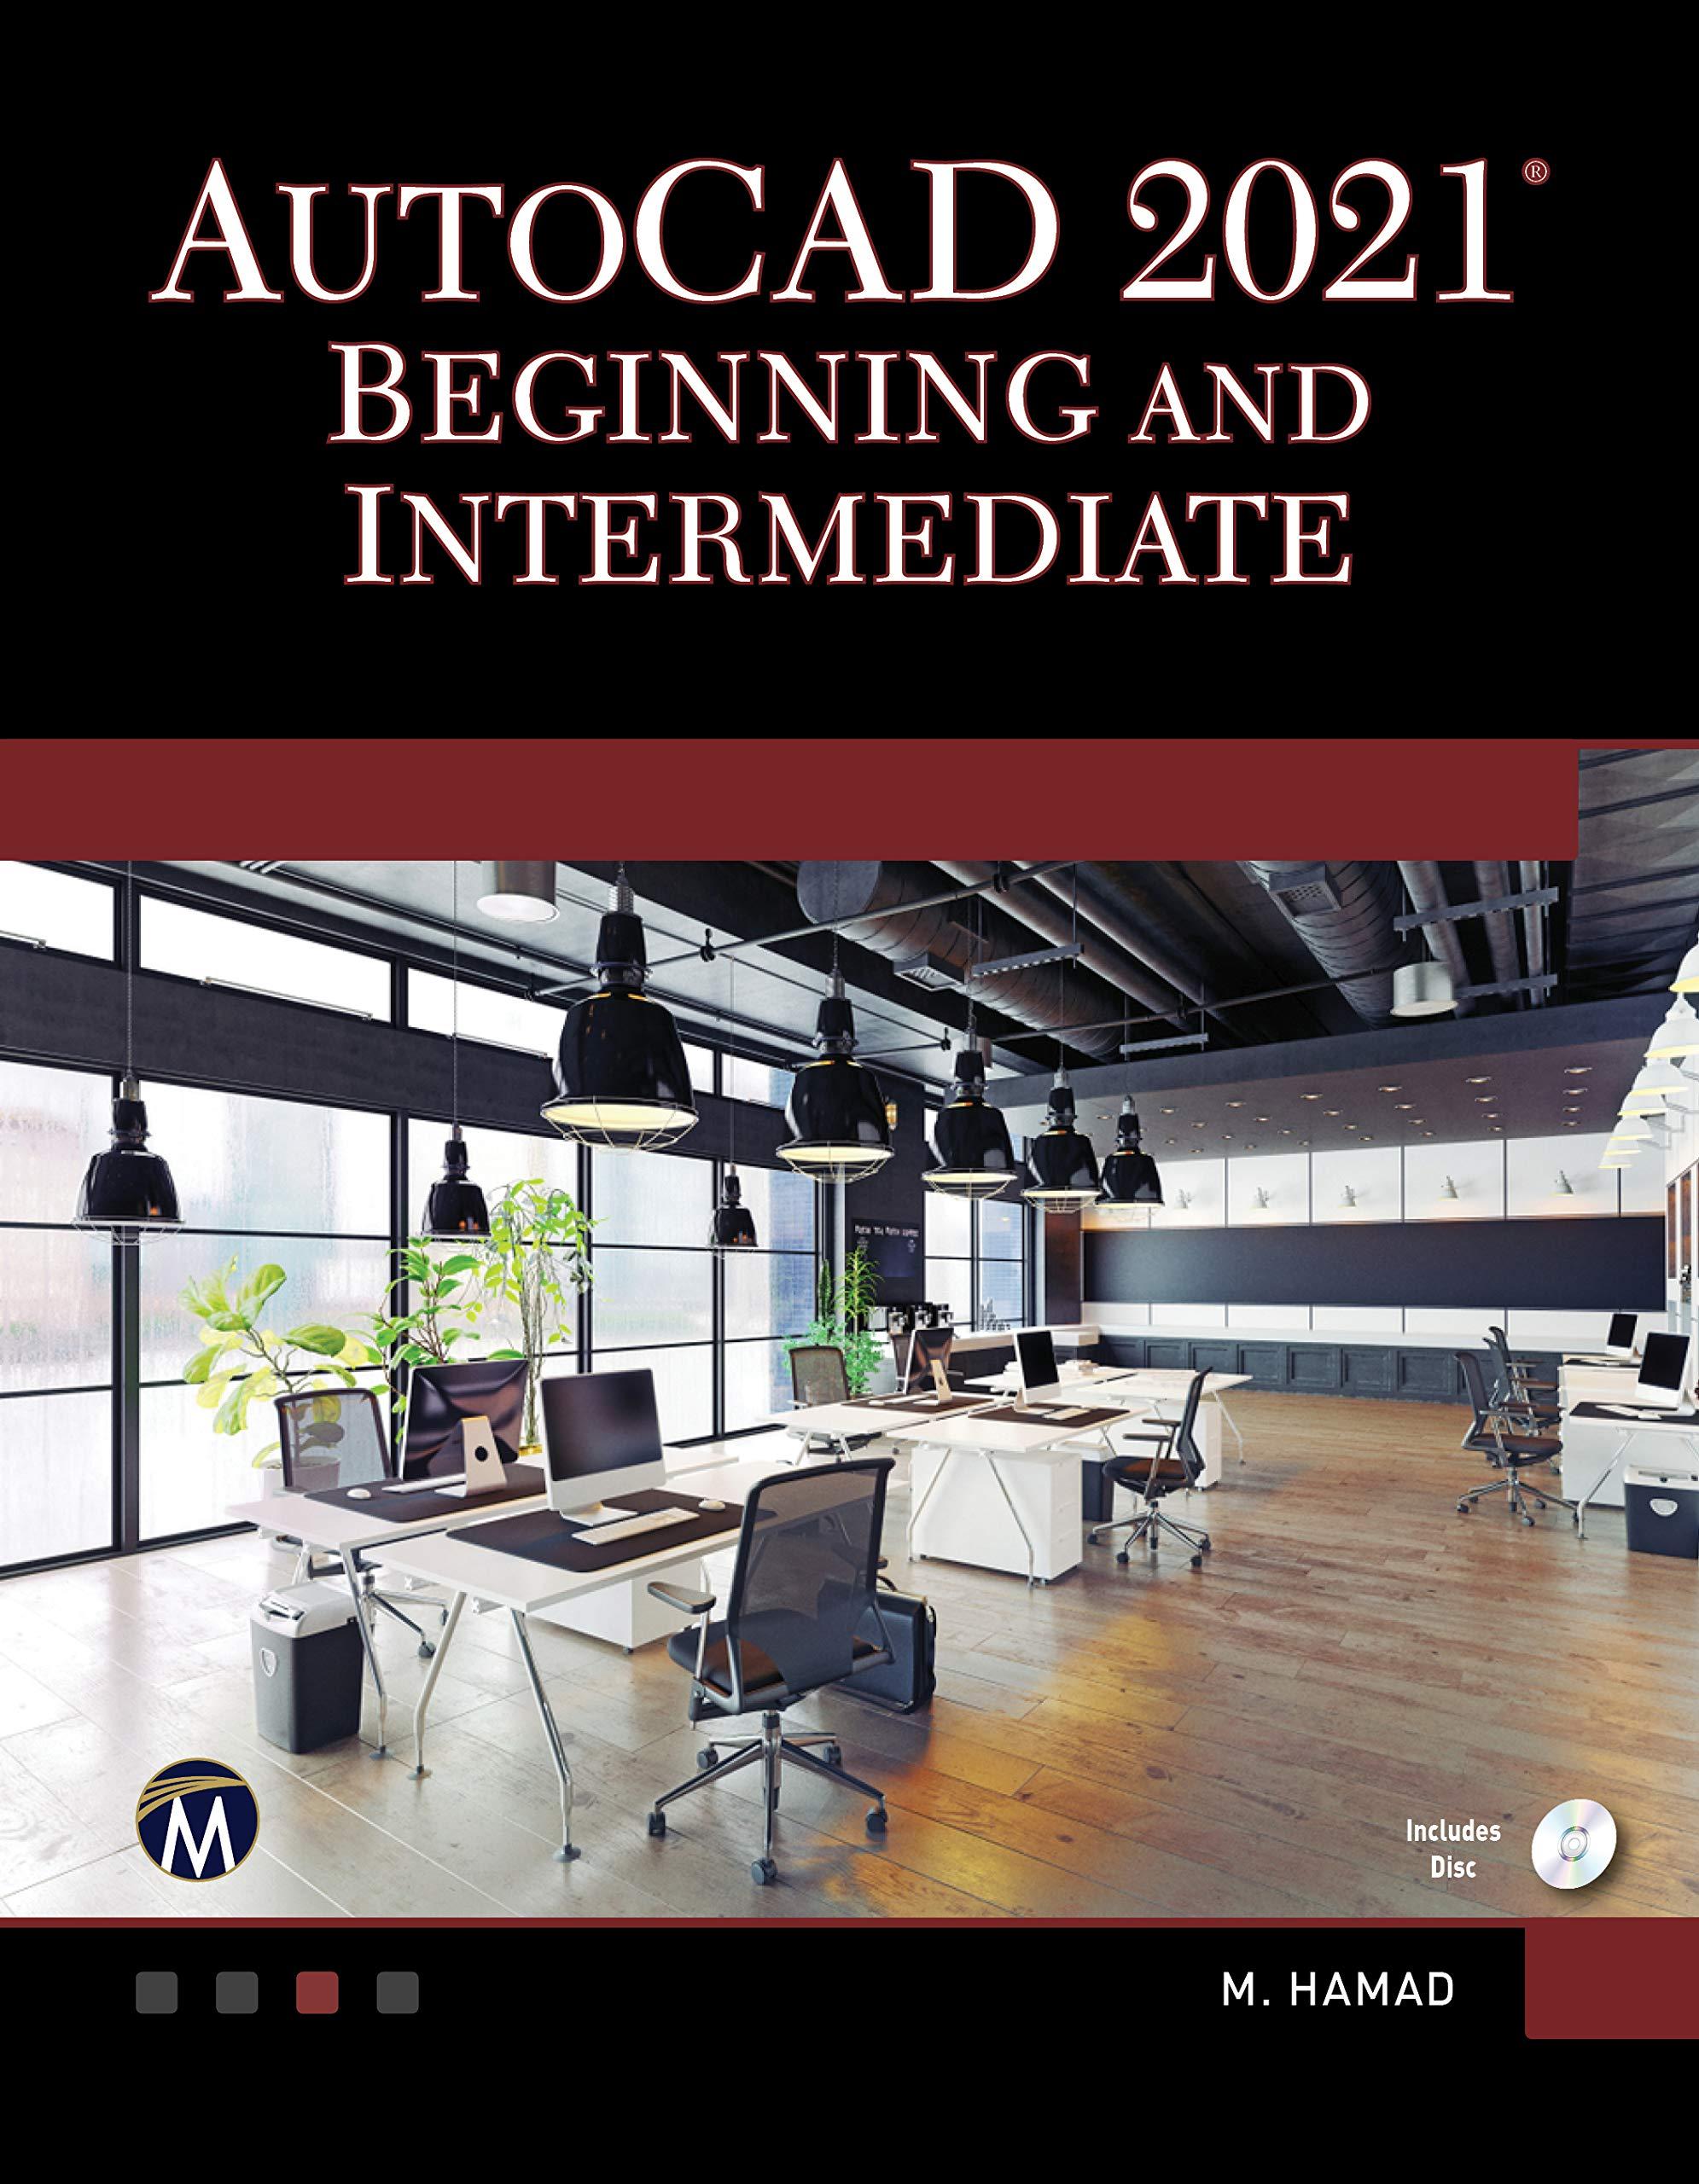 AutoCAD 2021 Beginning and Intermediate: Amazon.es: Hamad, Munir: Libros en idiomas extranjeros